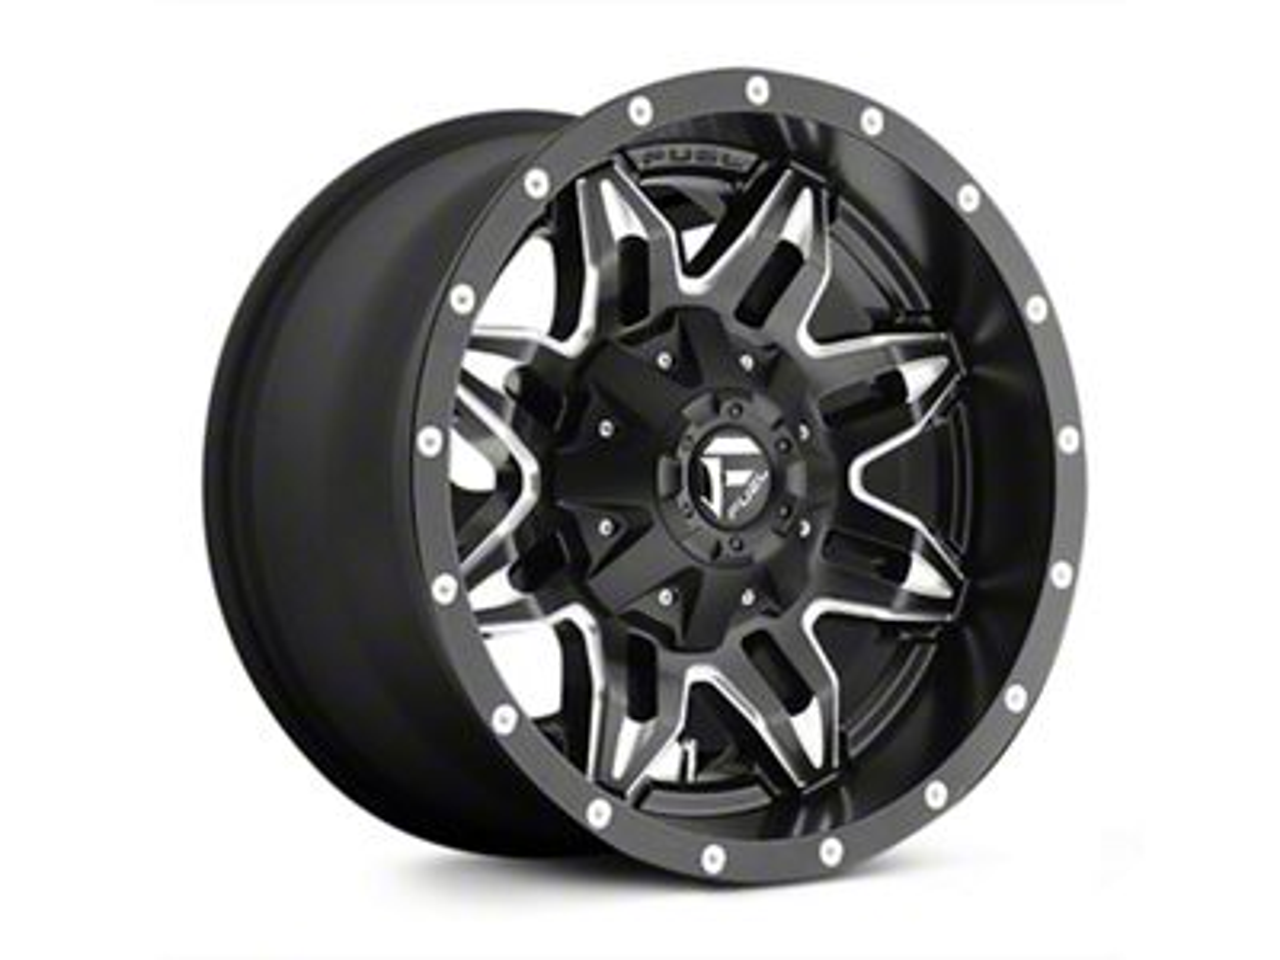 Fuel Wheels Lethal Black Milled Wheel - 20x9 (18-19 Jeep Wrangler JL)